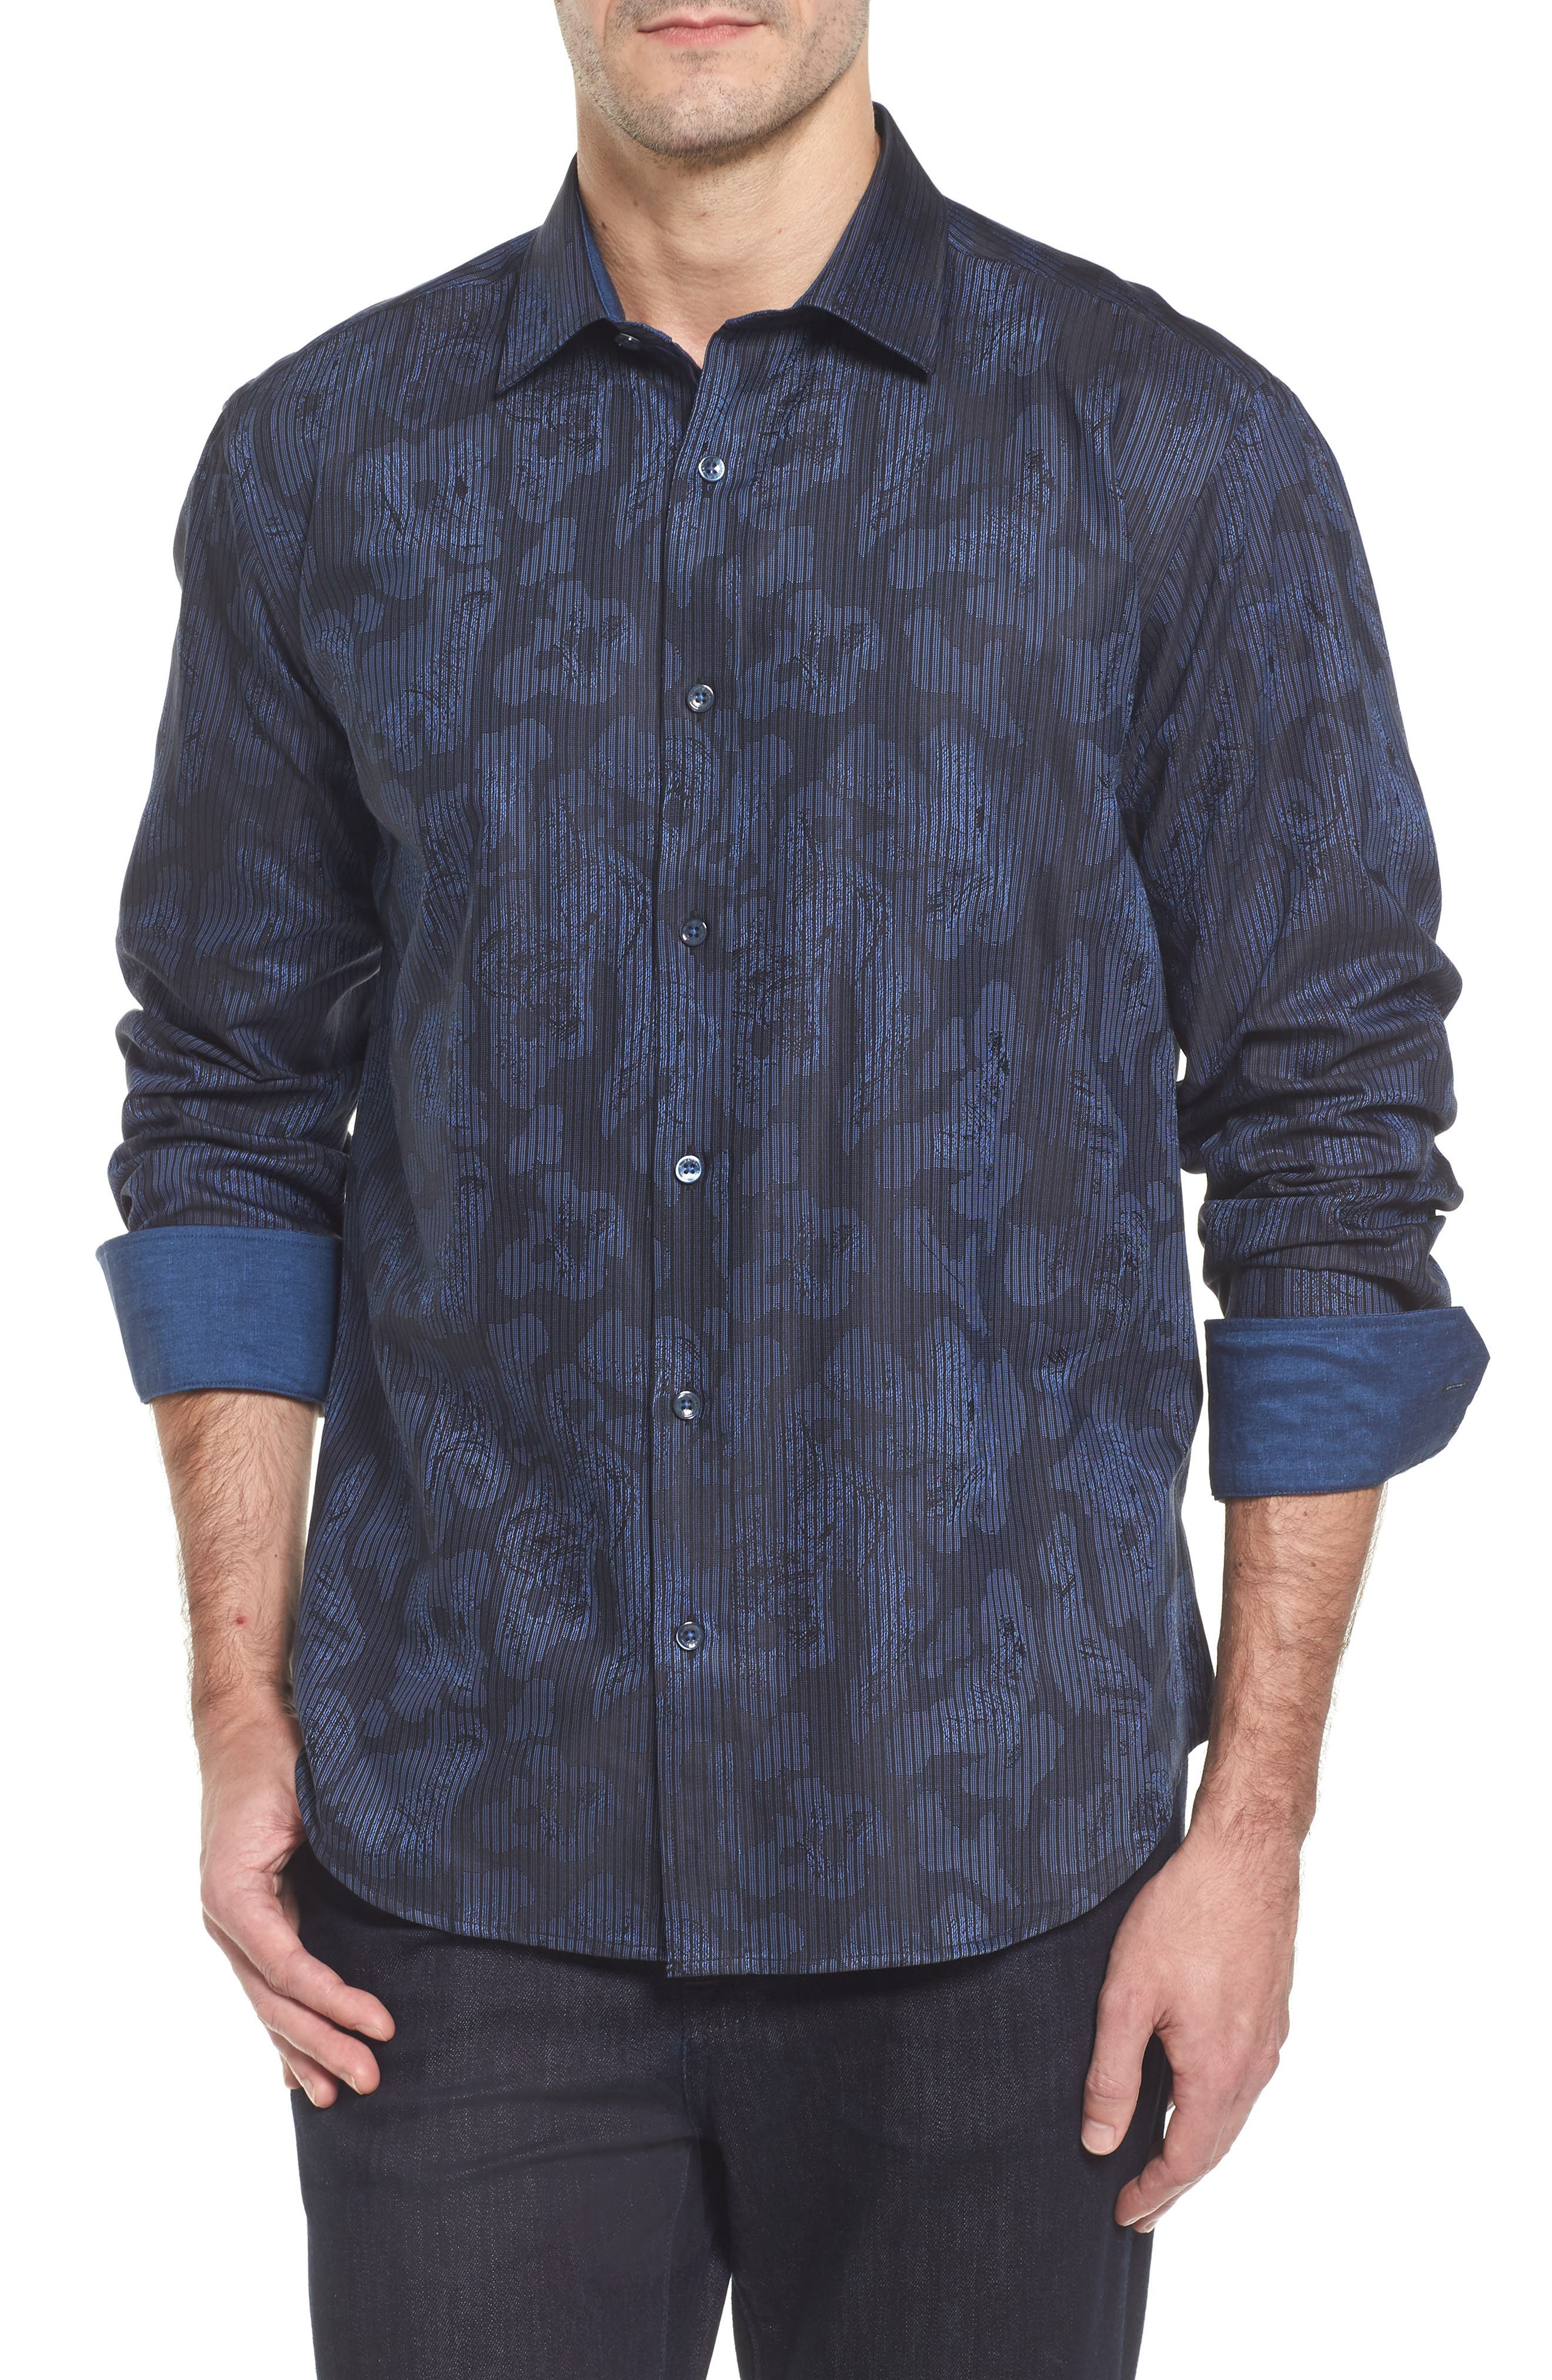 Alternate Image 1 Selected - Bugatchi Slim Fit Jacquard Stripe Sport Shirt